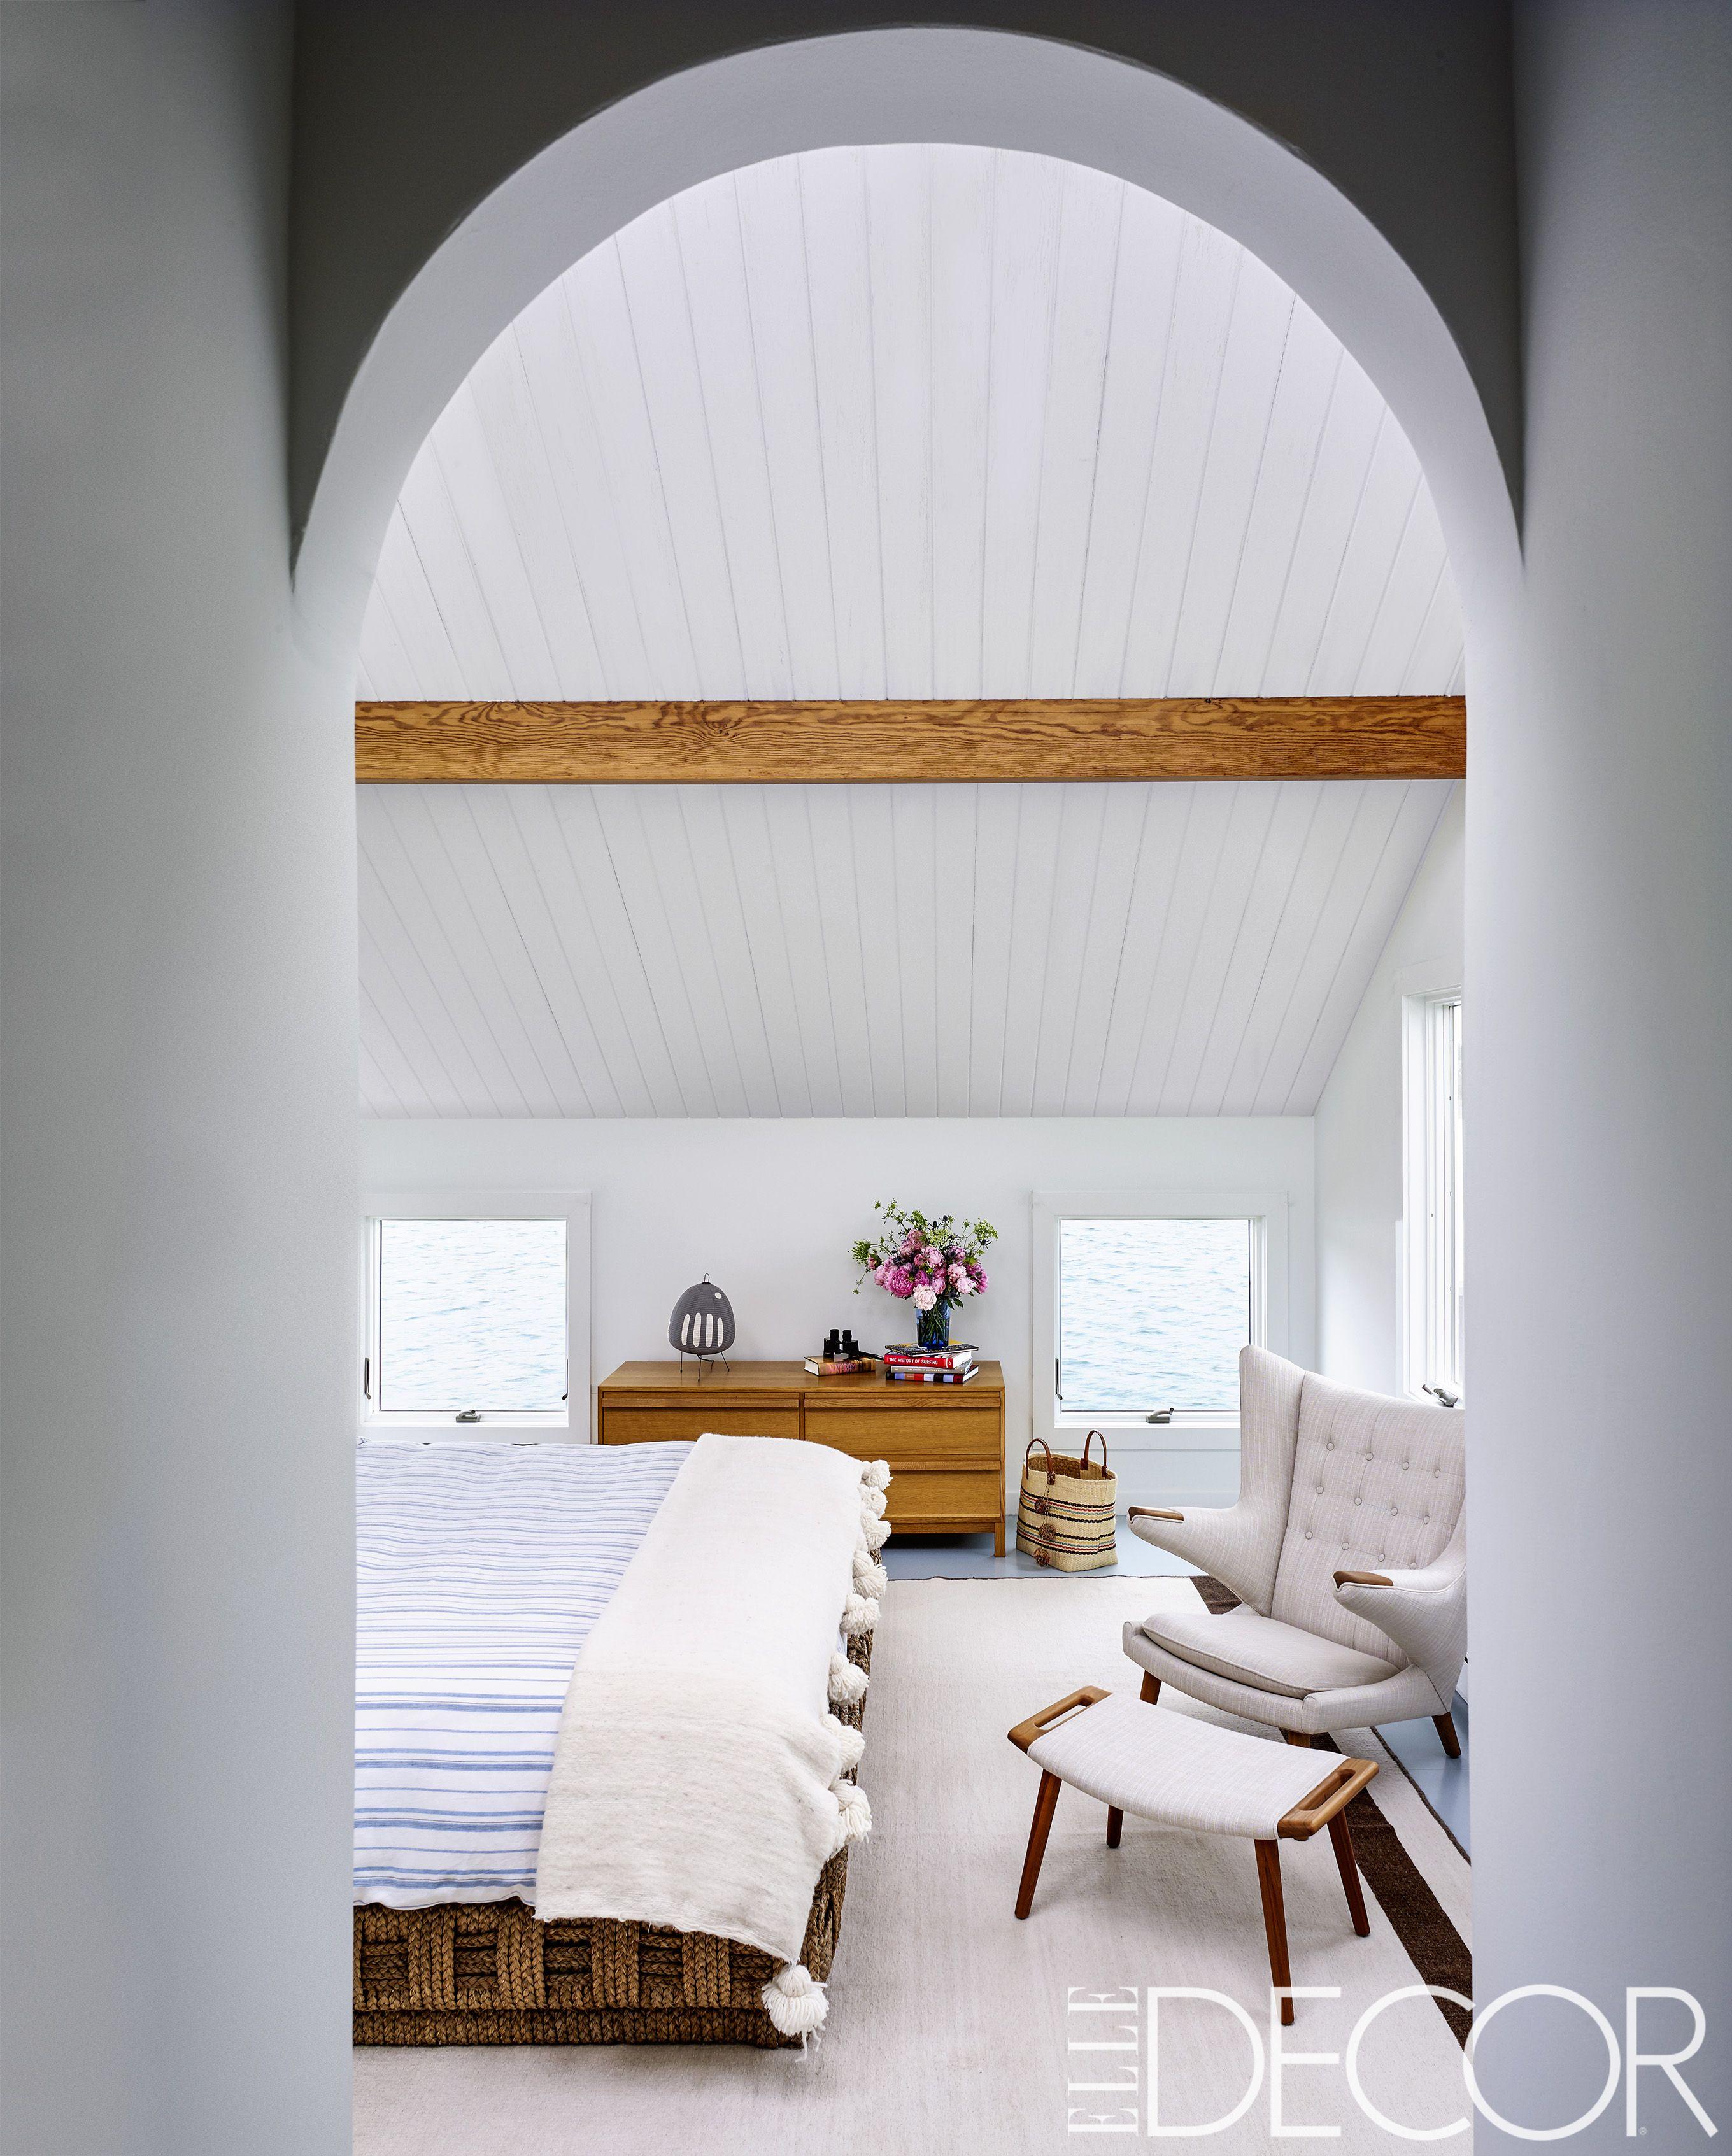 25 Minimalist Bedroom Decor Ideas - Modern Designs for ... on Bedroom Minimalist Design Ideas  id=62497